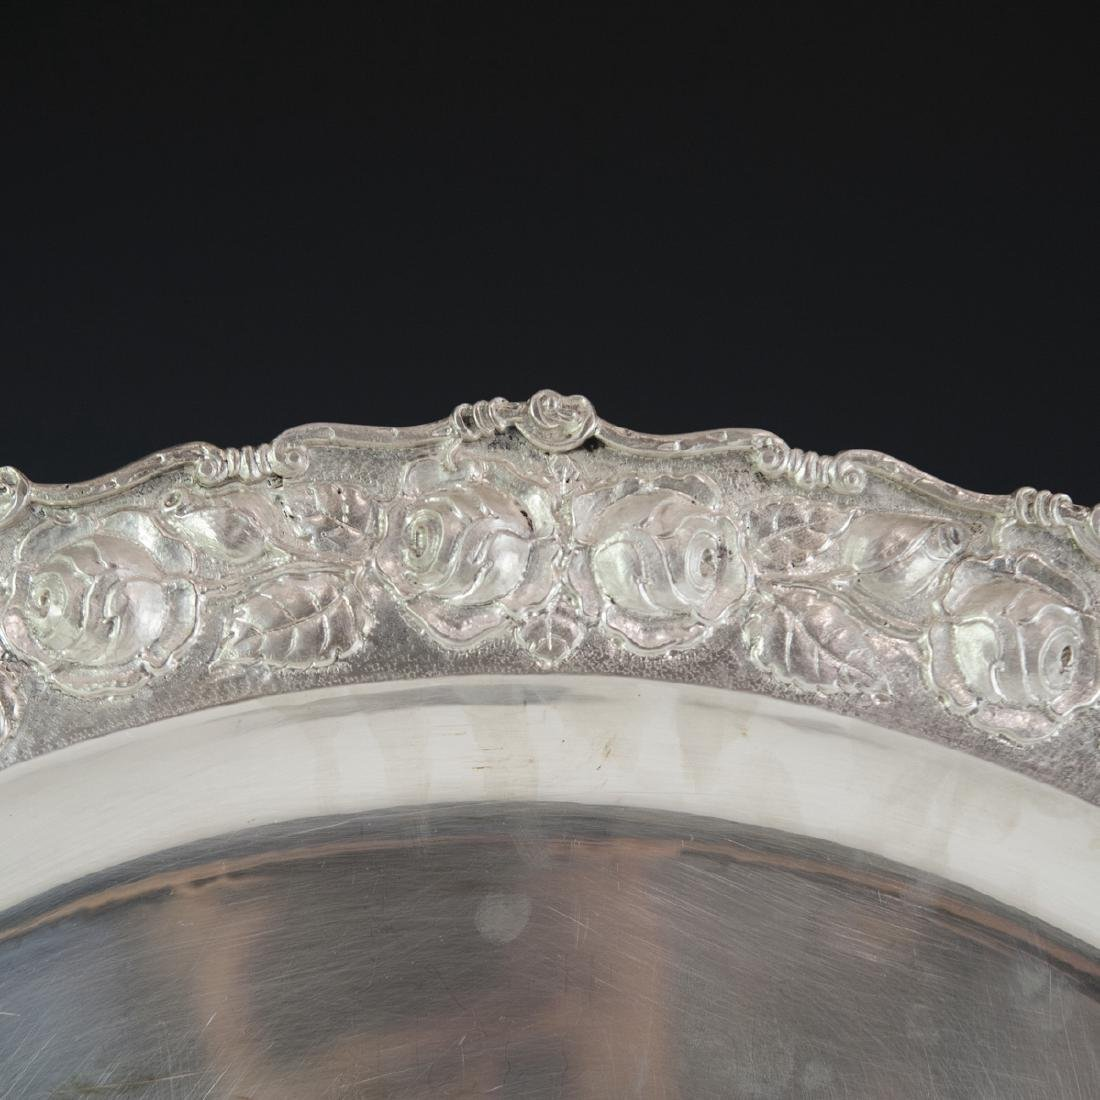 Romana 900 Silver Repousse Tray - 2